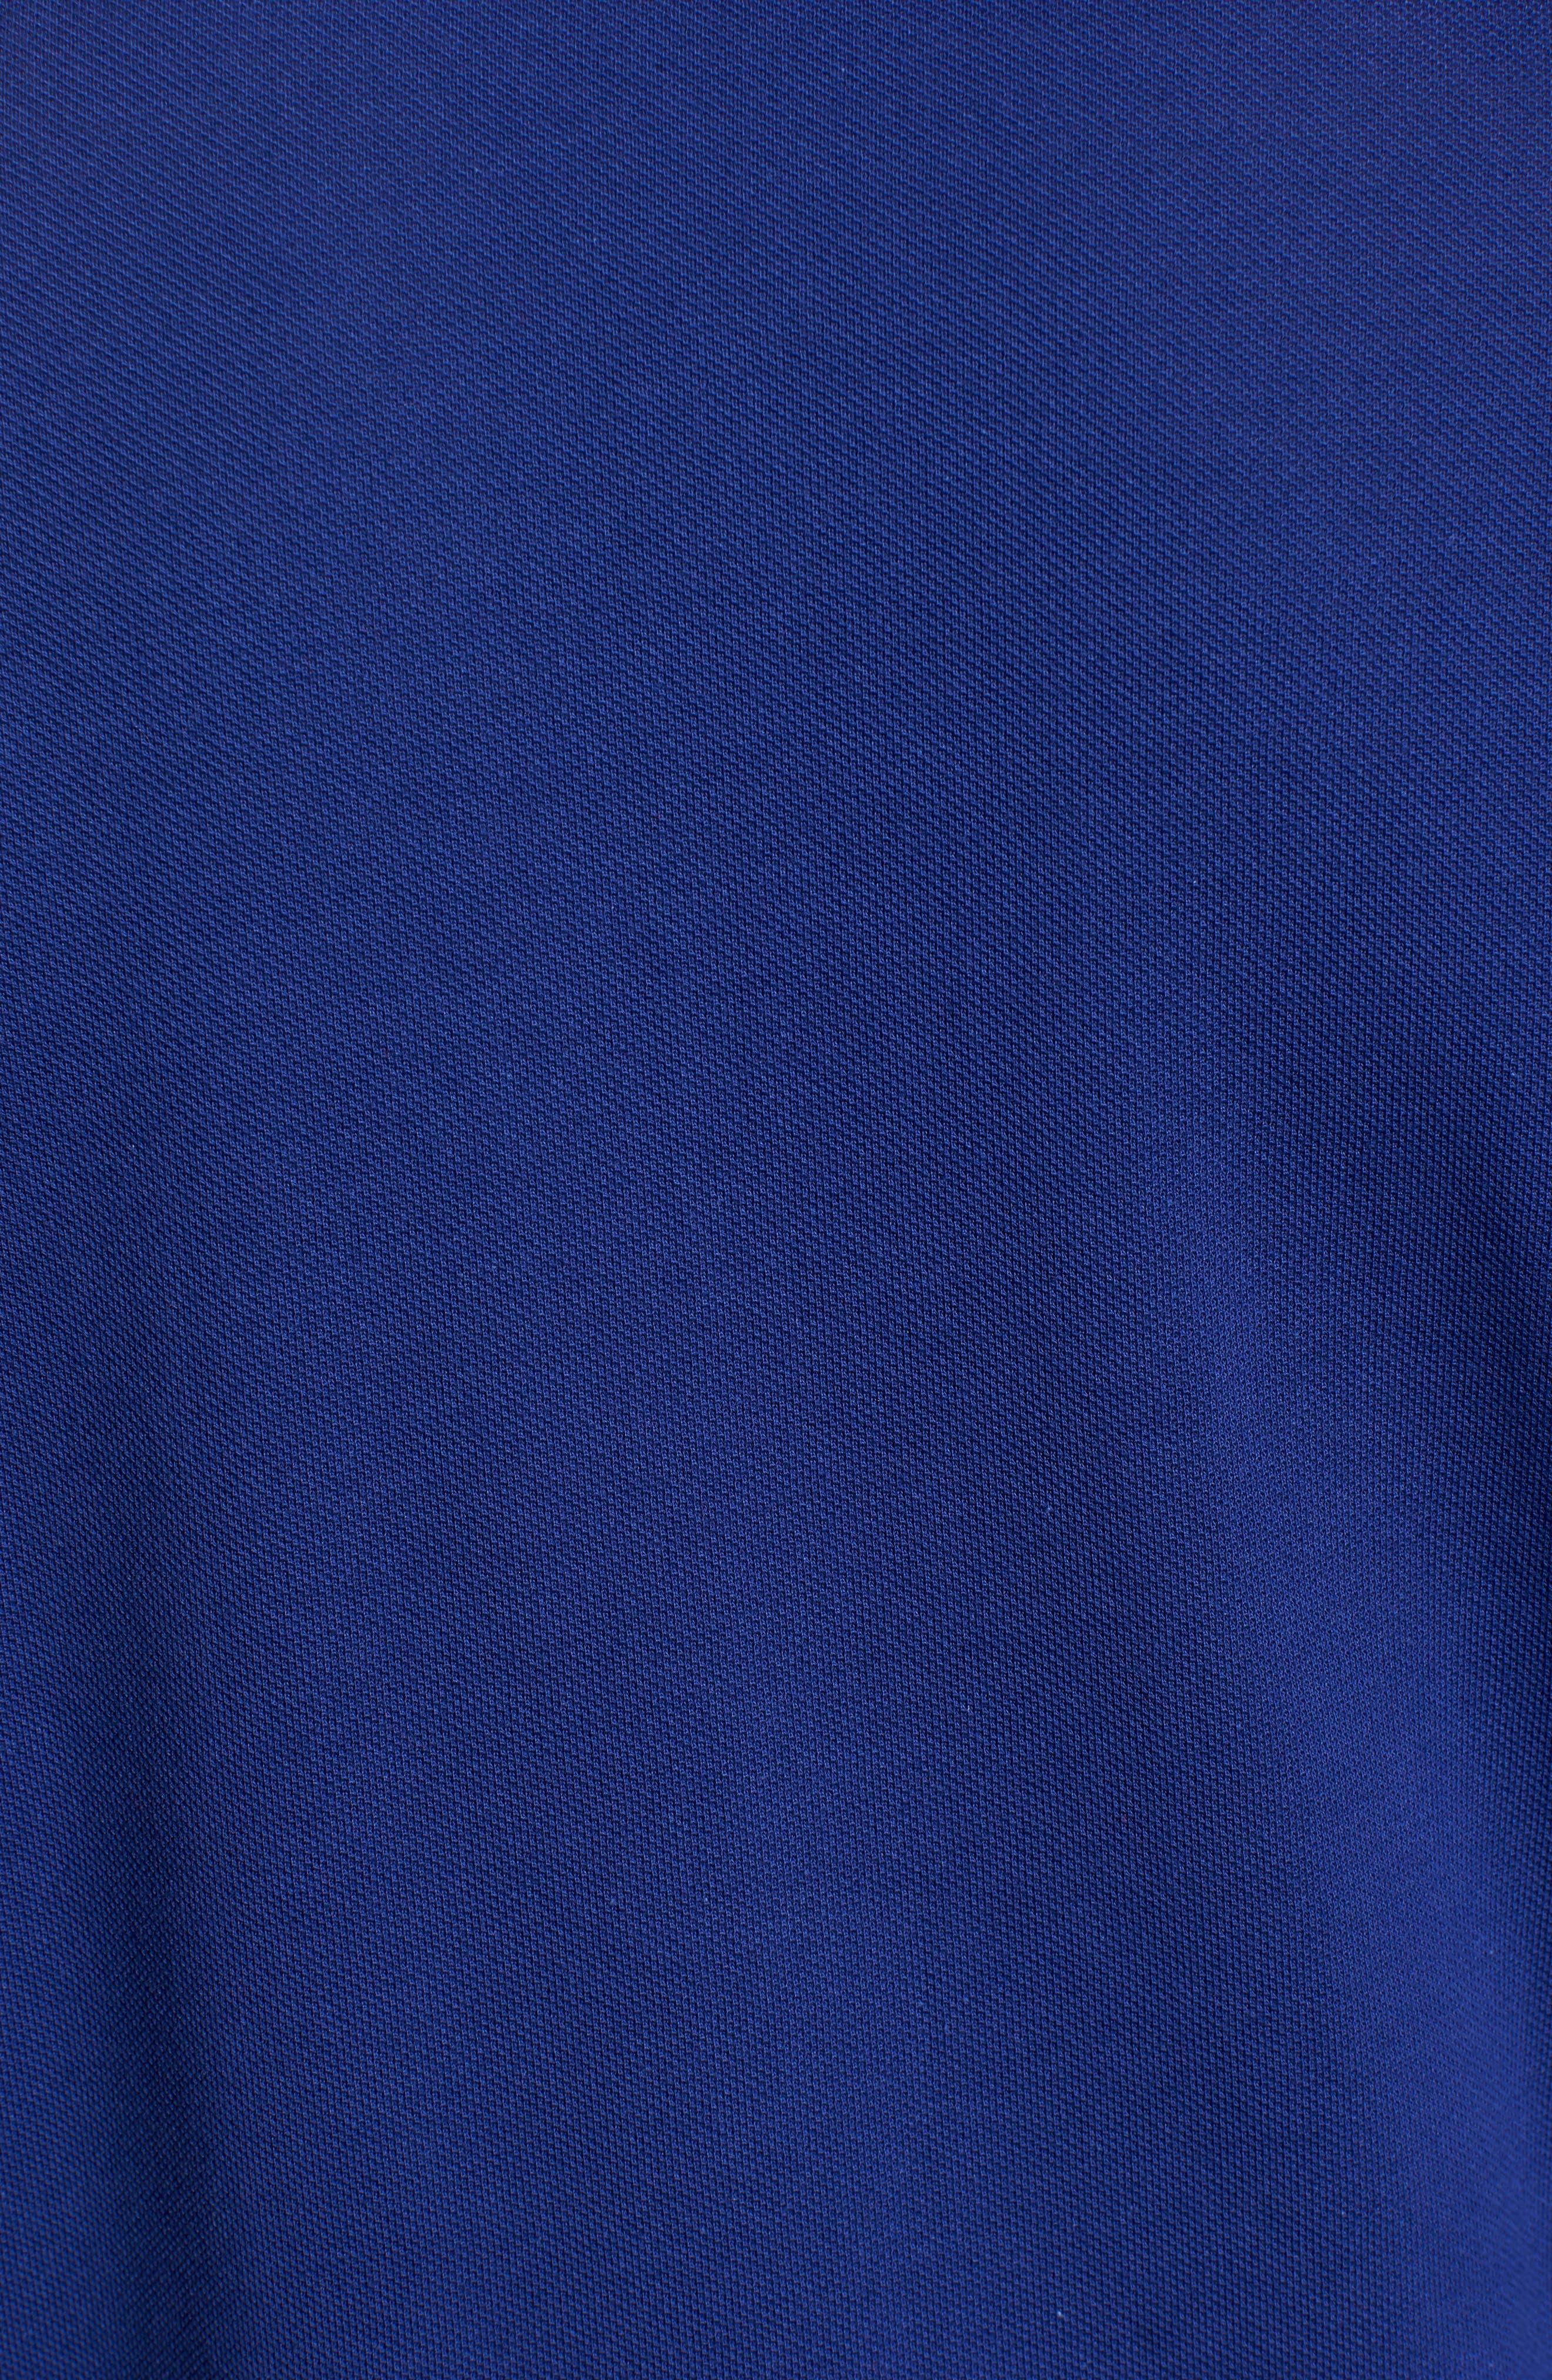 Classic Fit Long Sleeve Piqué Polo,                             Alternate thumbnail 5, color,                             OCEAN